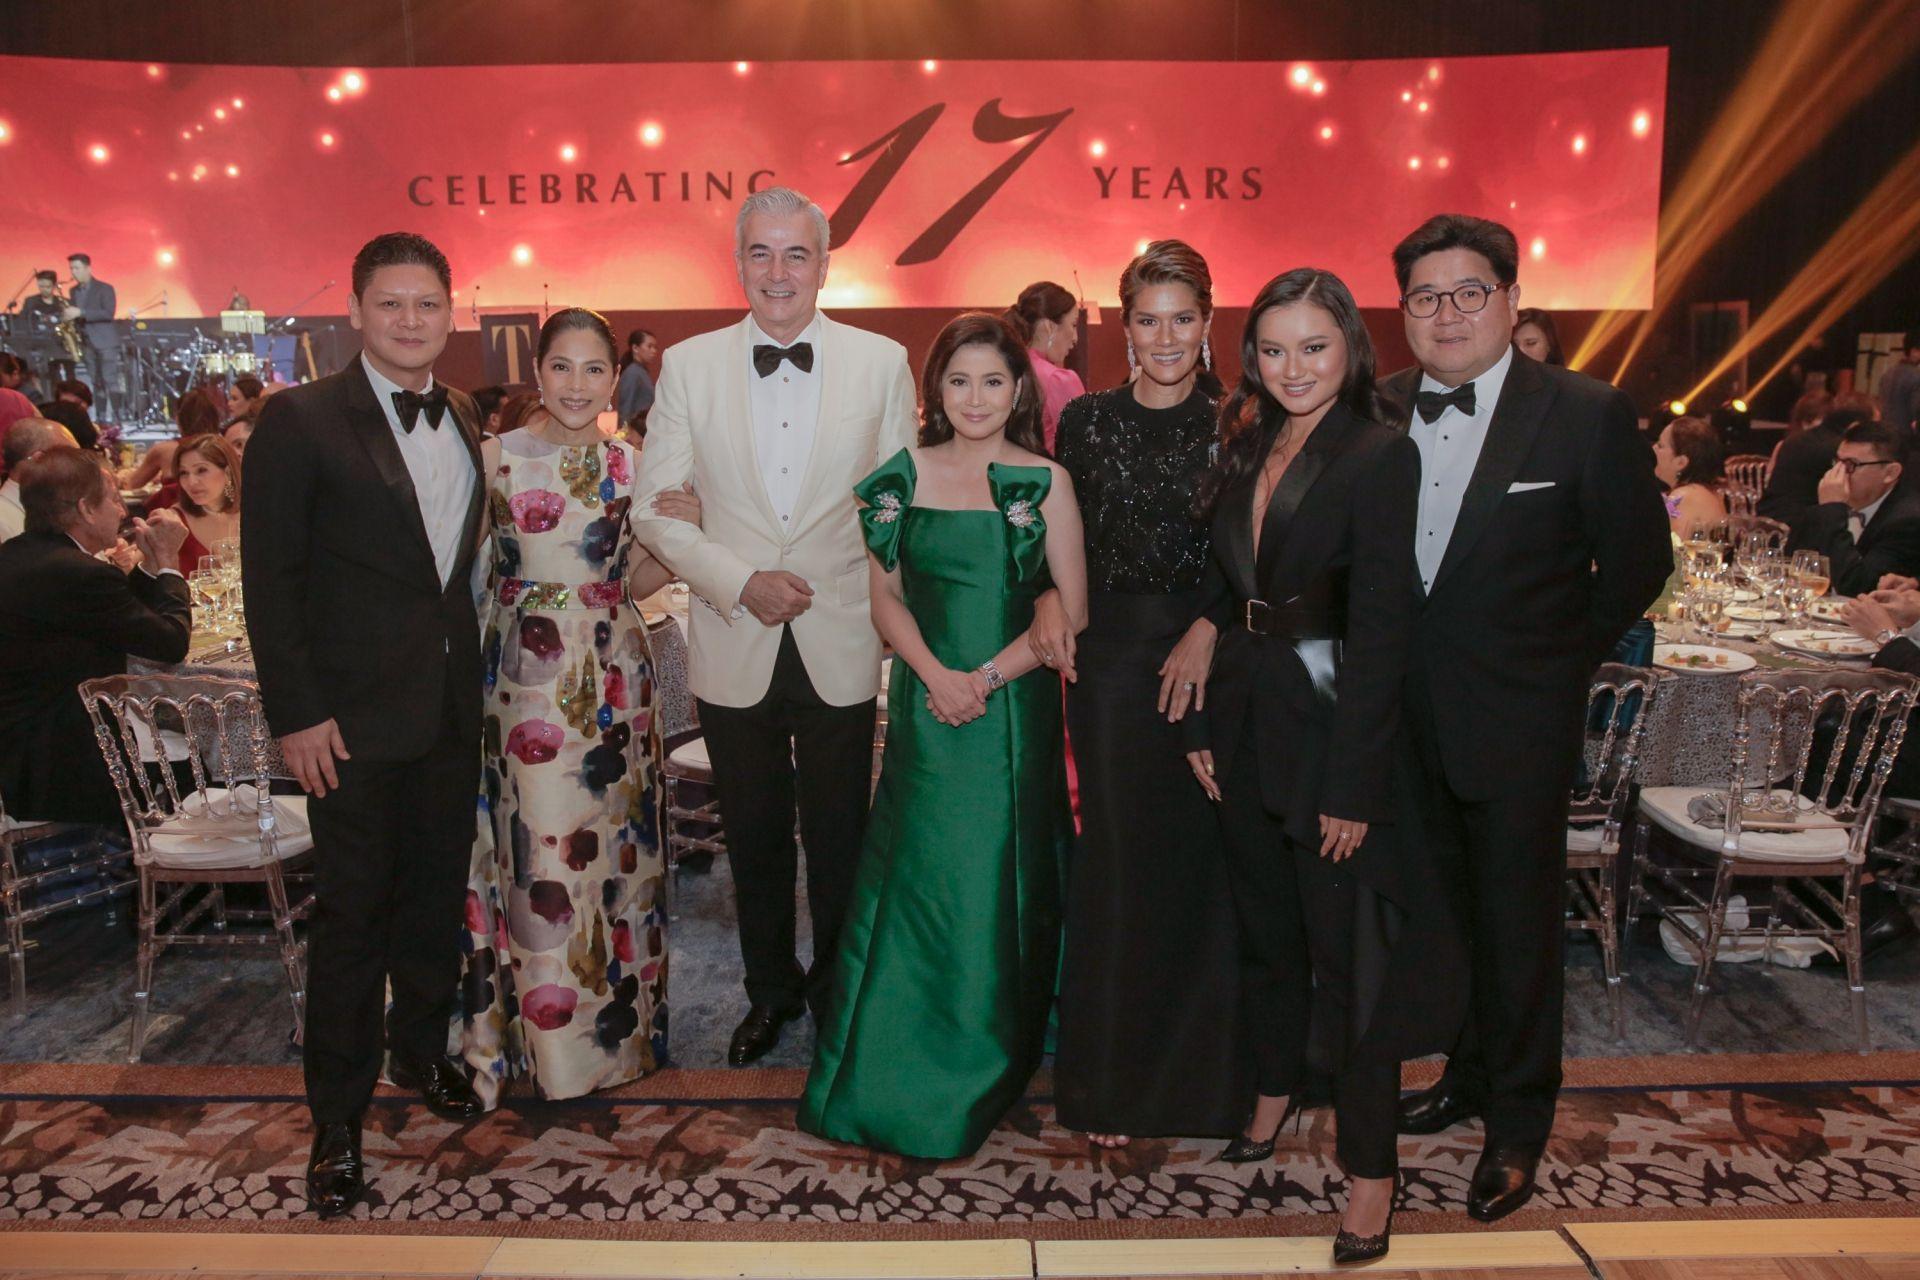 Anton San Diego, Kit Zobel, Fernando Zobel, Berna Romulo Puyat, Nina Huang, Nikki Huang, Anton Huang